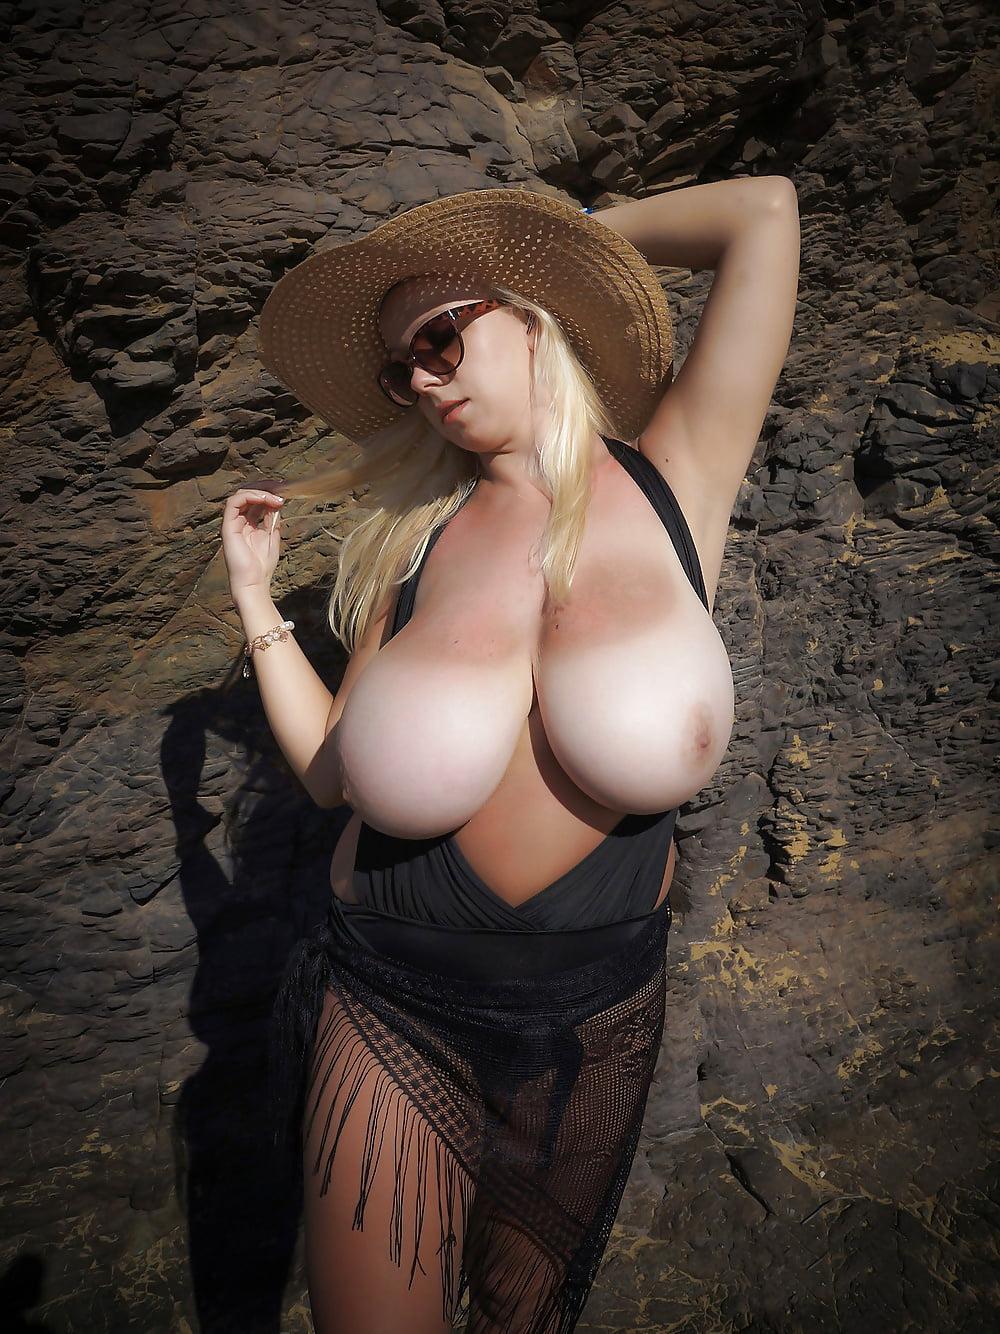 Download huge tits